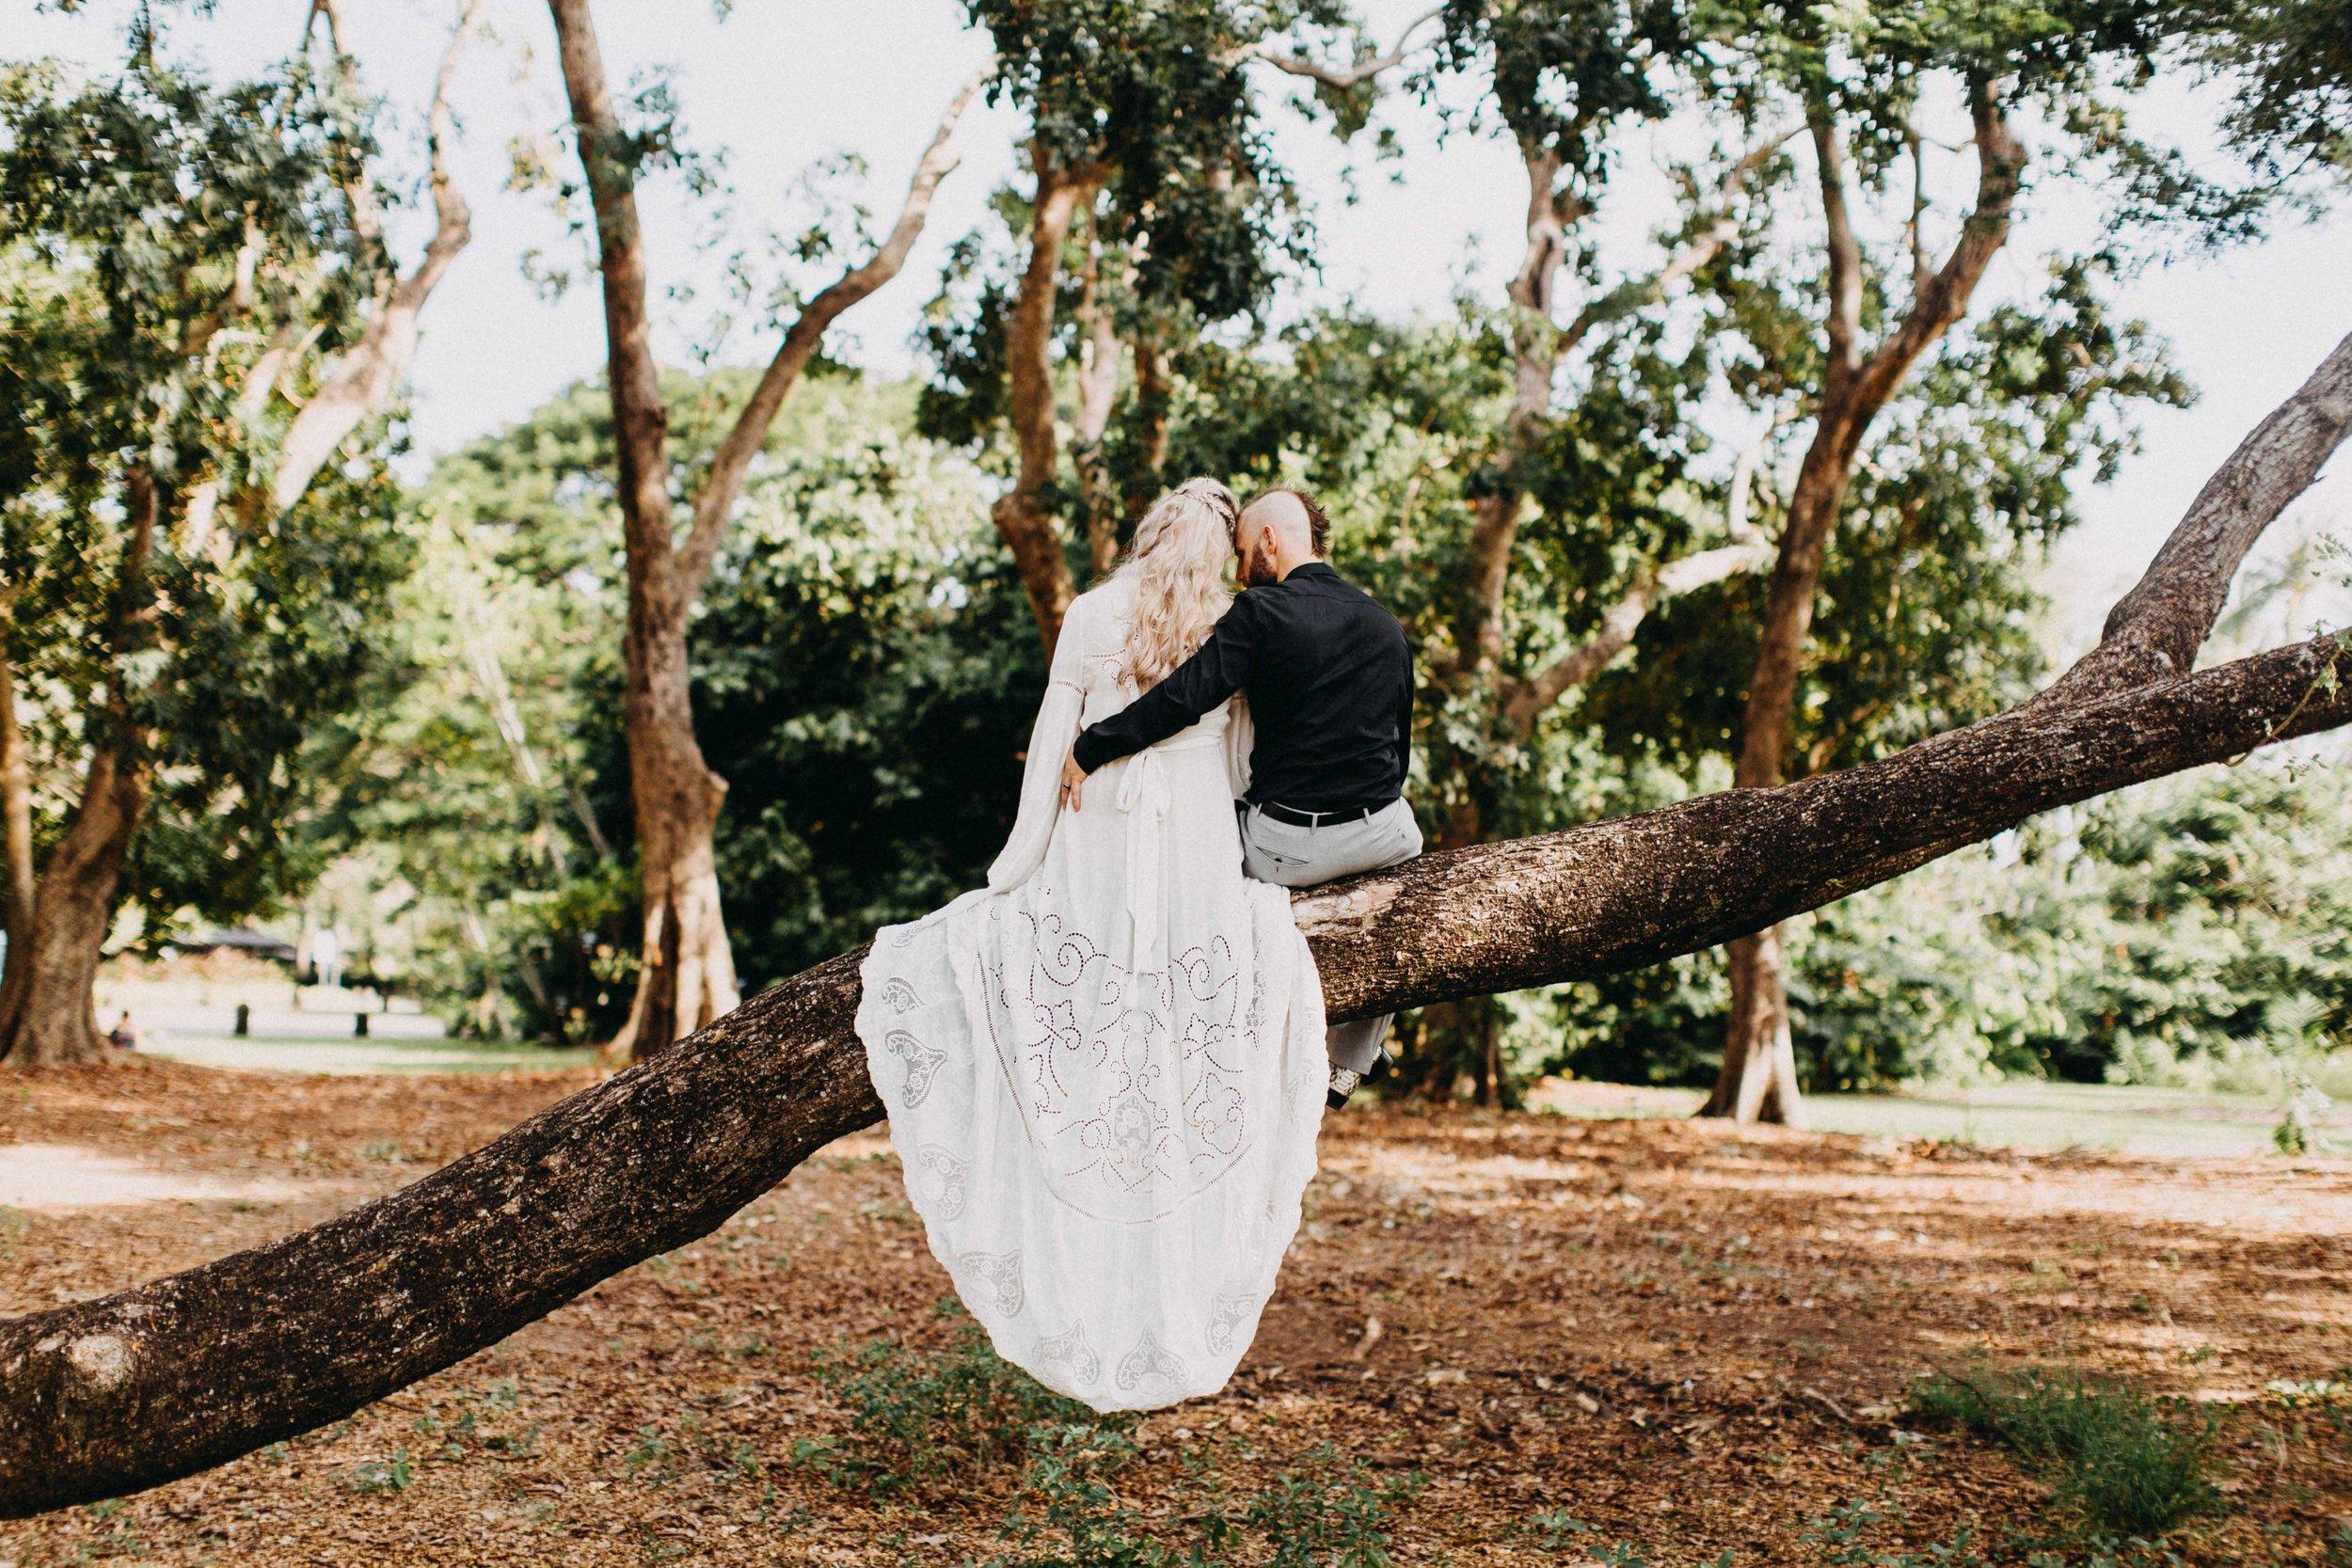 darwin-elopement-wedding-beach-camden-photography-www.emilyobrienphotography.net-38.jpg